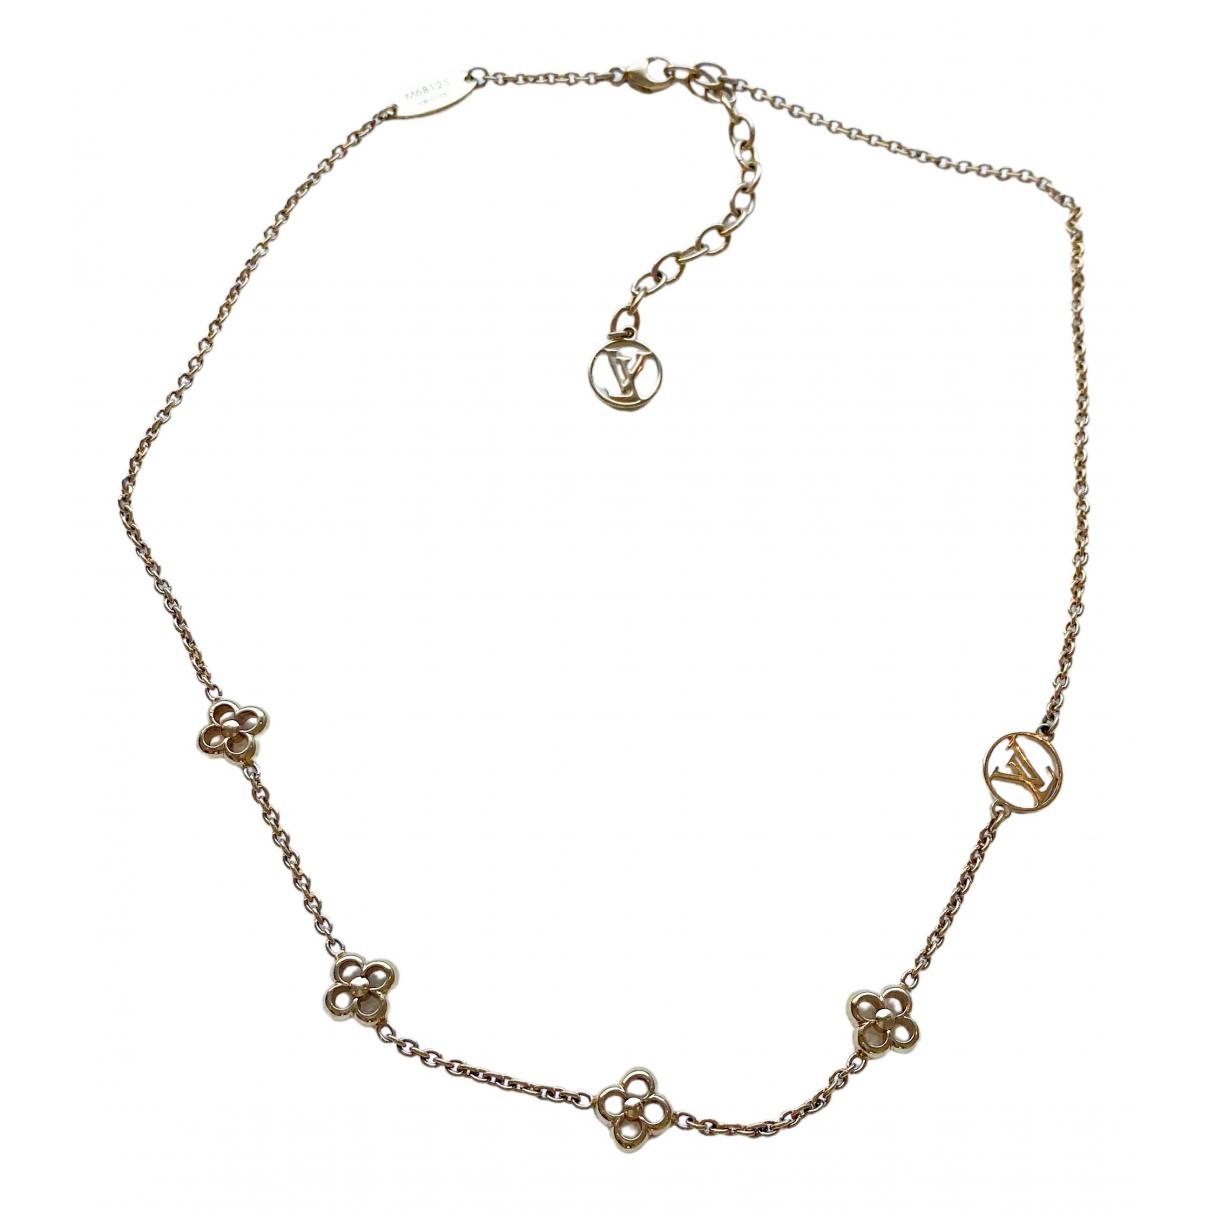 Collar Monogram Louis Vuitton